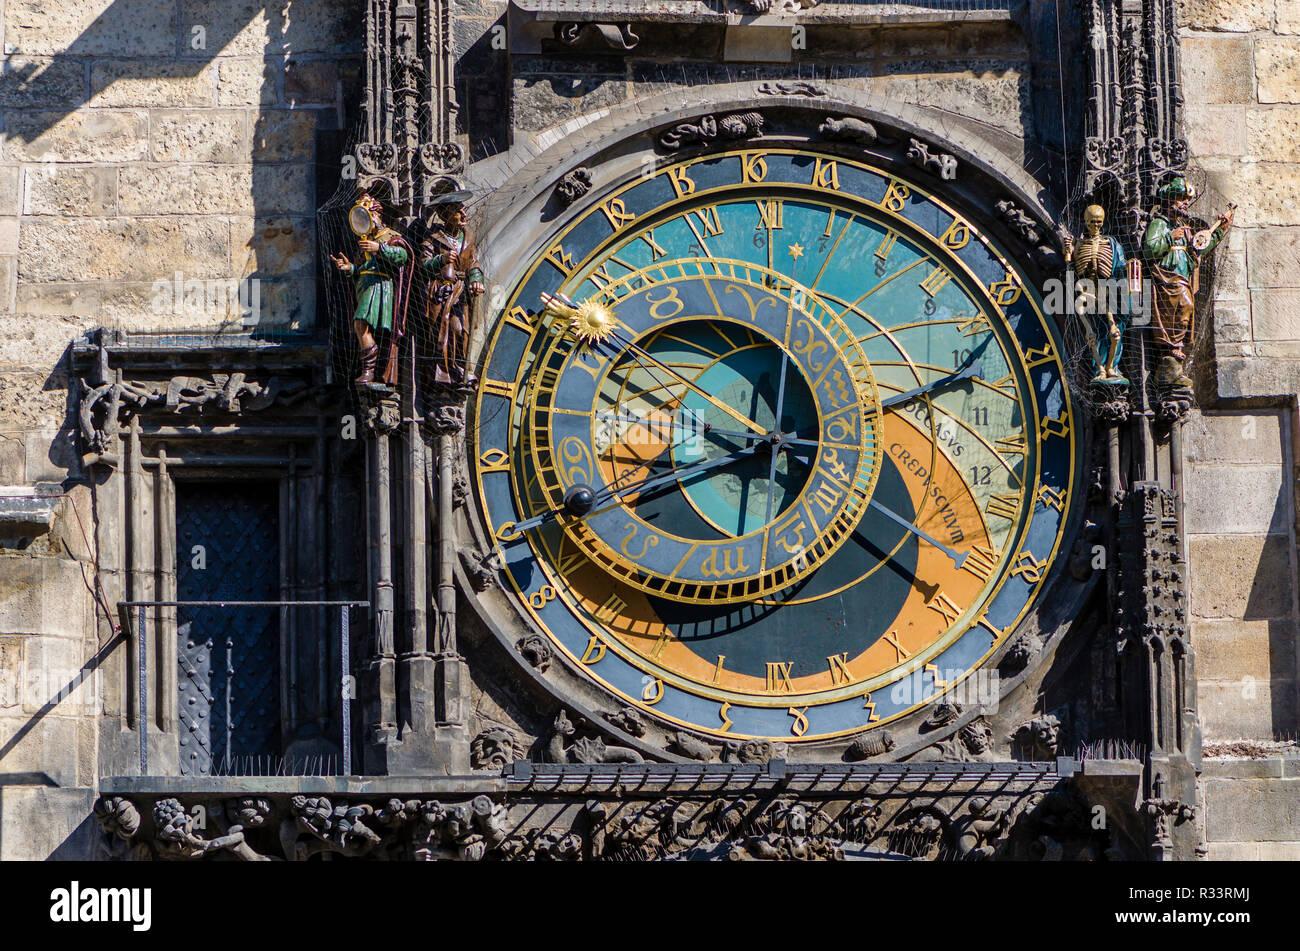 """Prazsky orloj"", the astronomical clock of Prague's town hall, was built in 1410 by royal clockmaker Mikulas of Kadan Stock Photo"